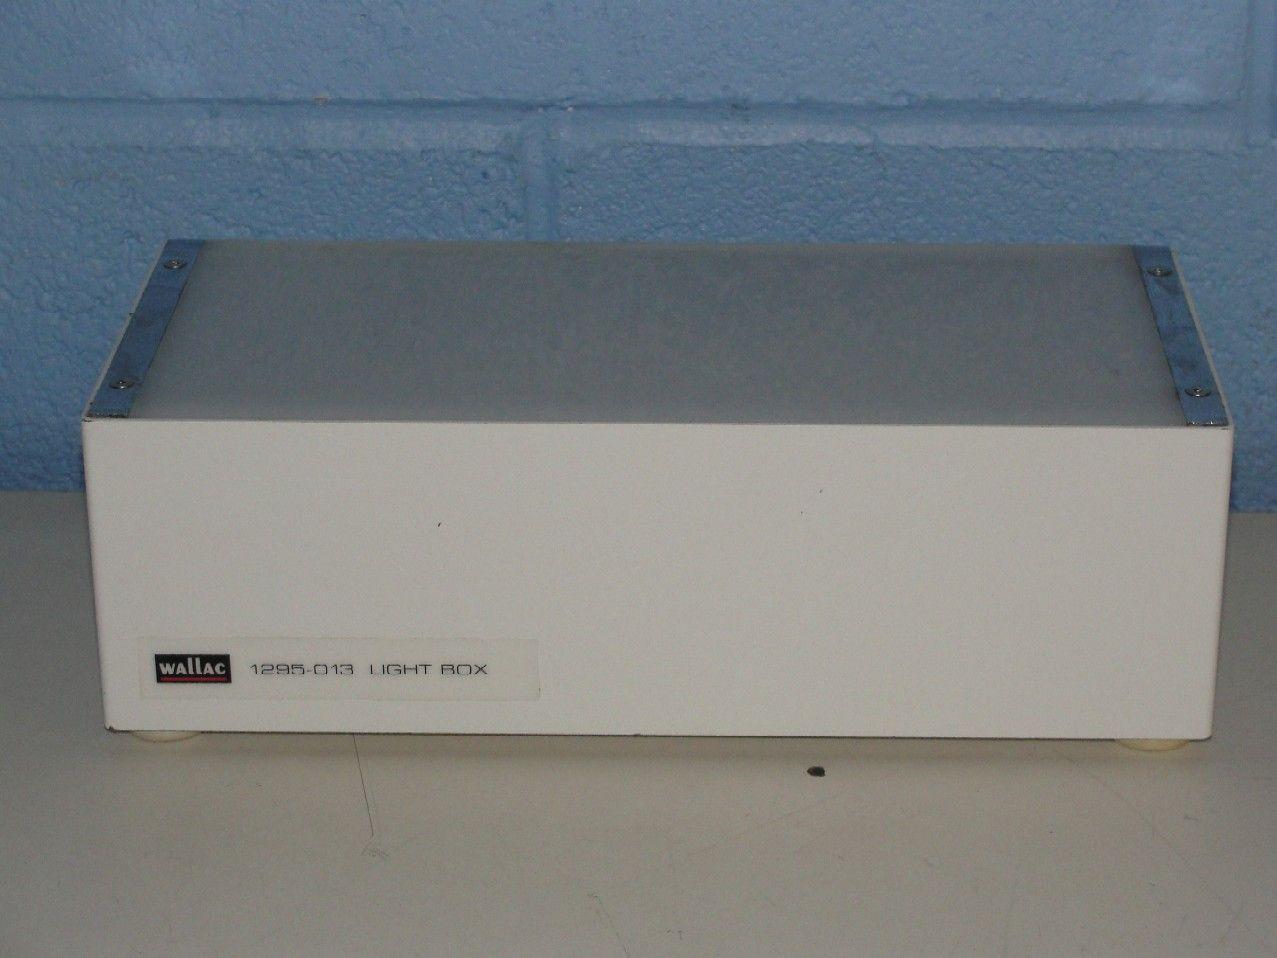 Wallac Light Box Model 1295-013